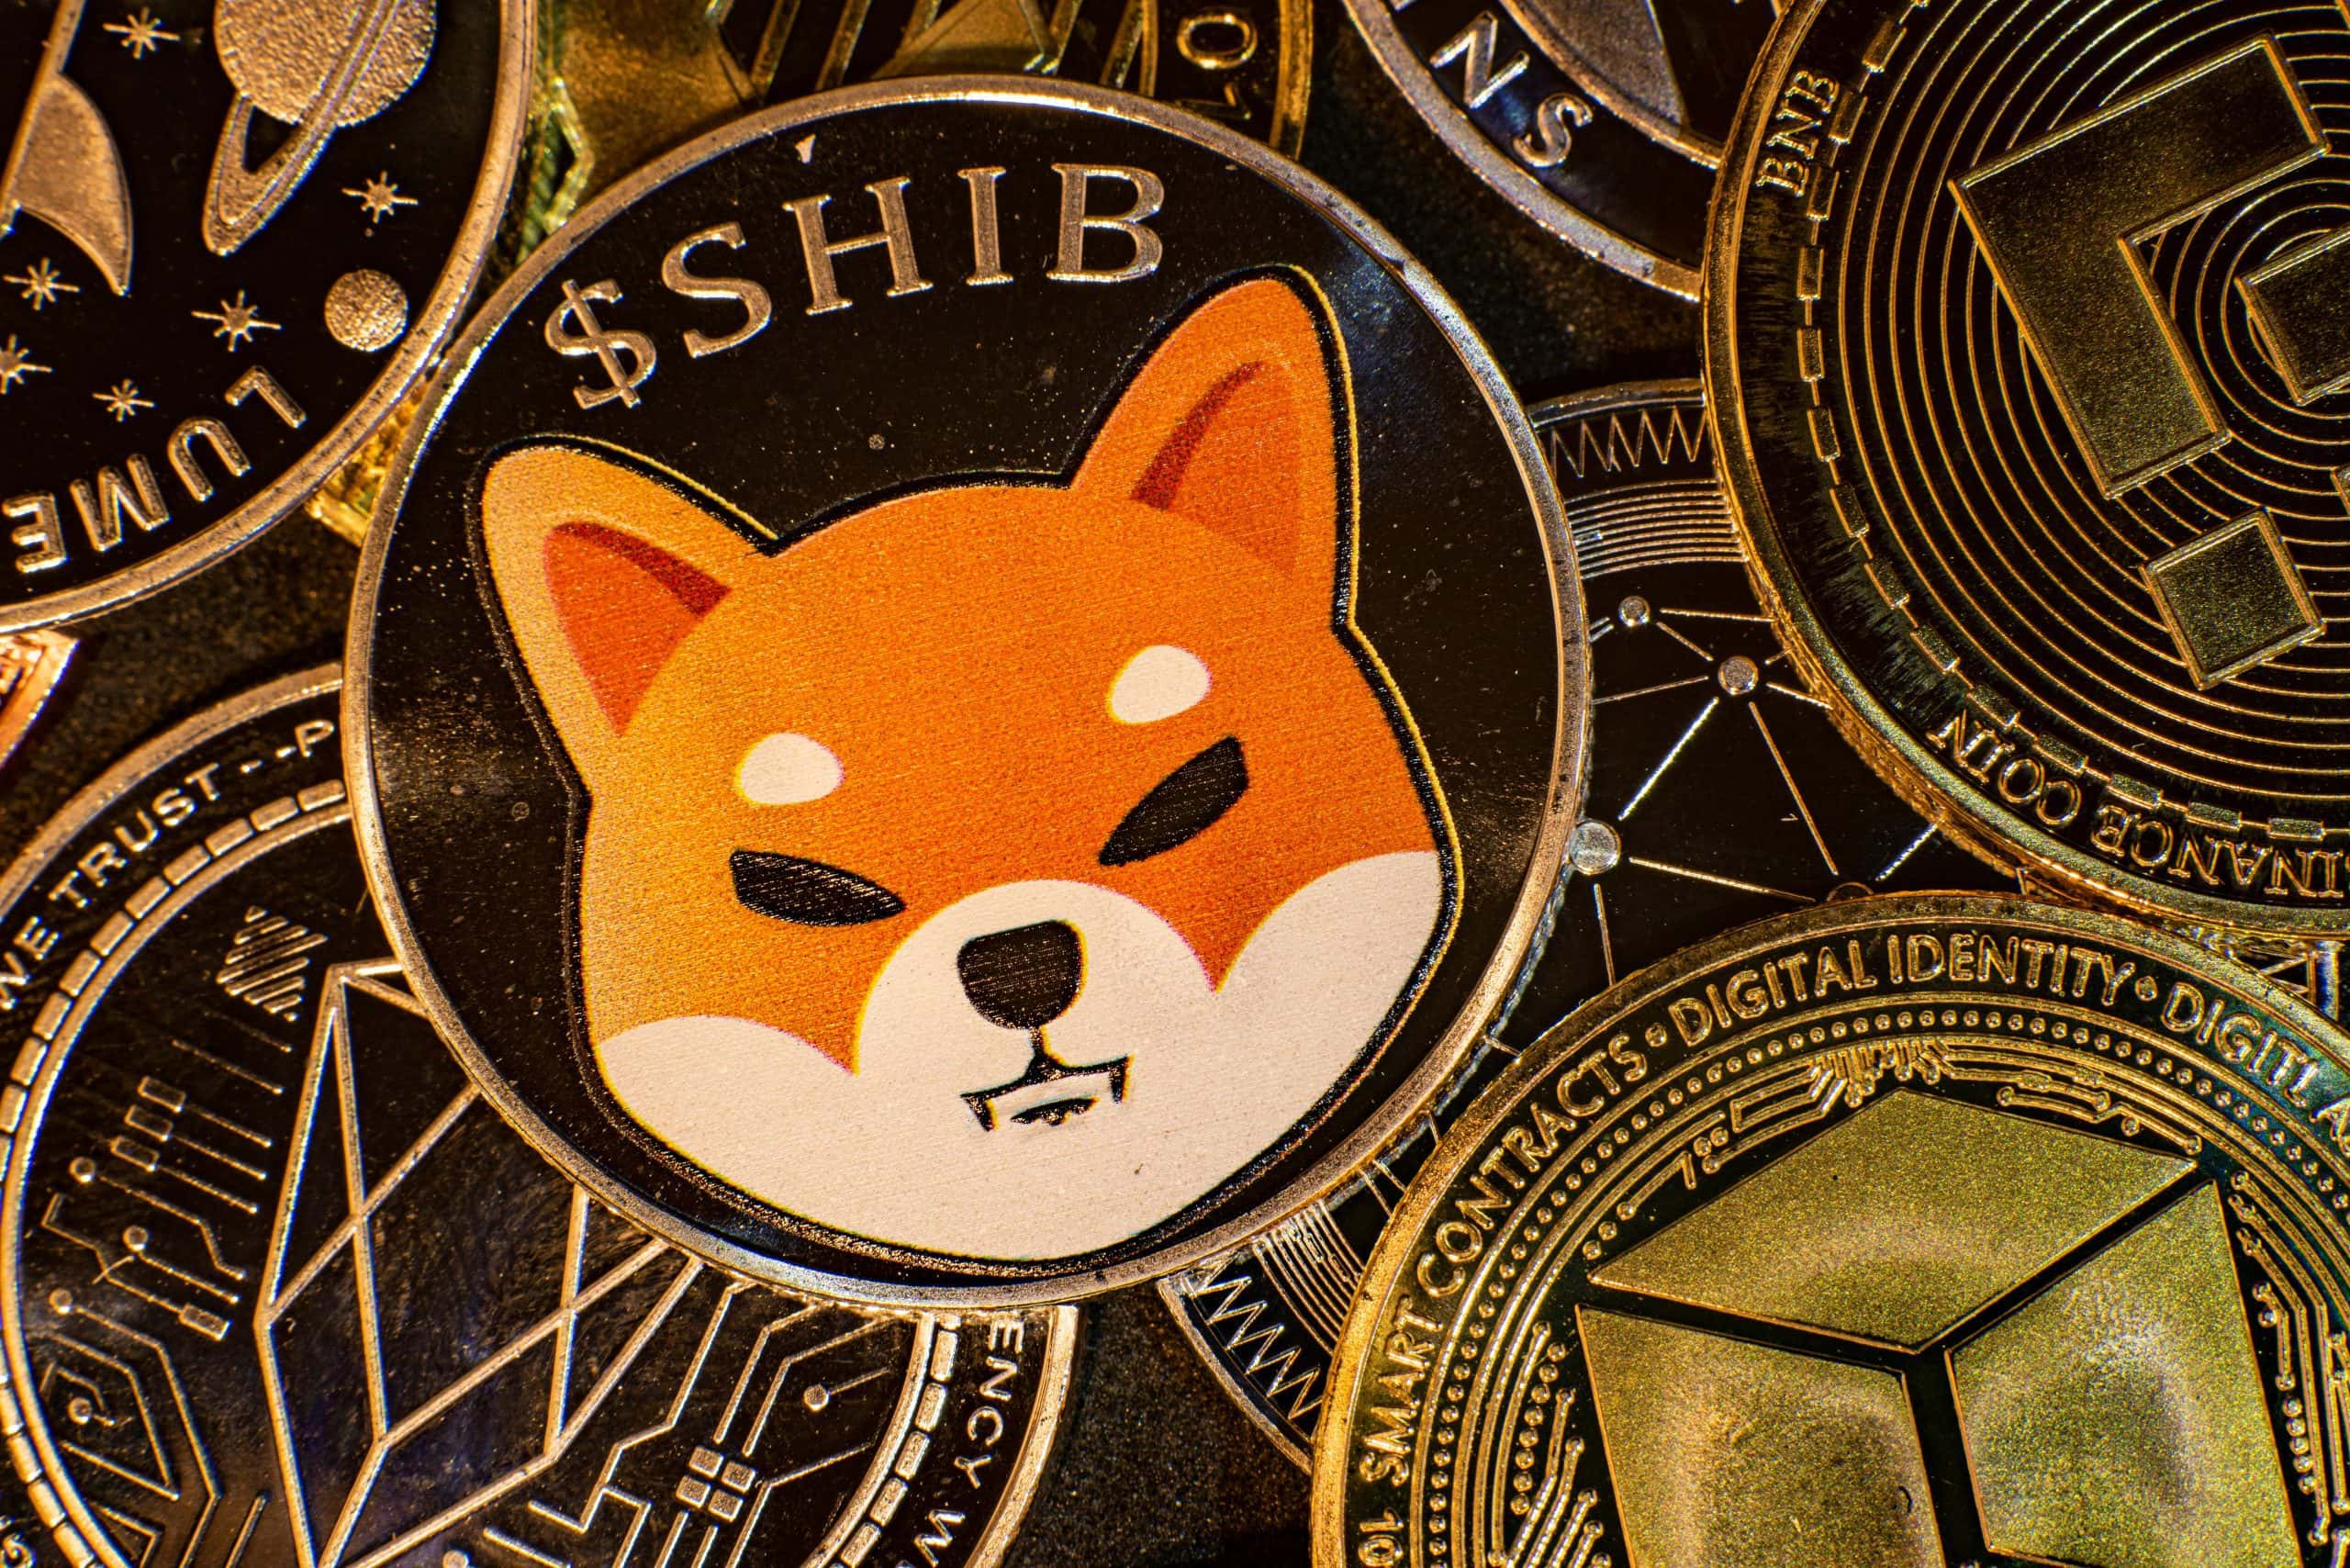 Shiba Inu knackt Allzeithoch – Krypto-Wal kauft 277 Milliarden SHIB